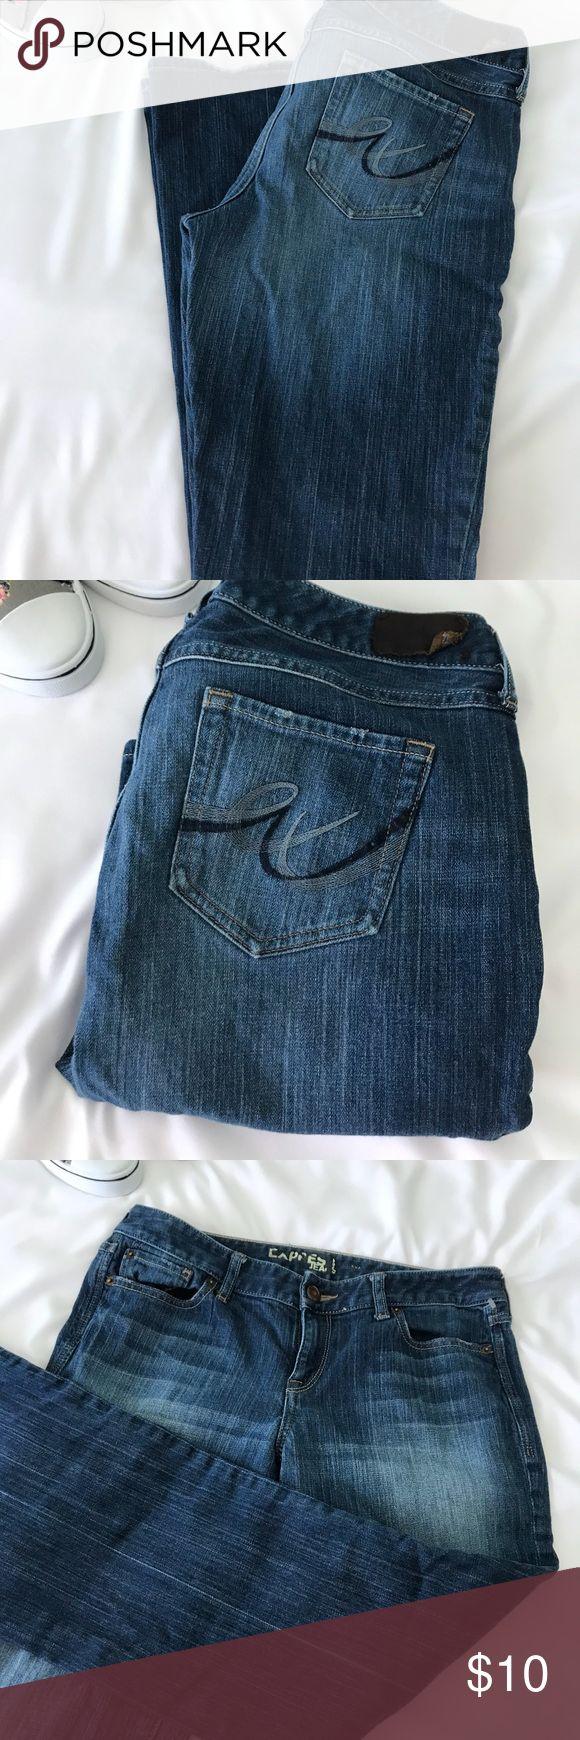 Express straight cut jeans Size 8 express jeans  Measuring flat Length 40' Inseam 31' Waist 31' Express Jeans Straight Leg